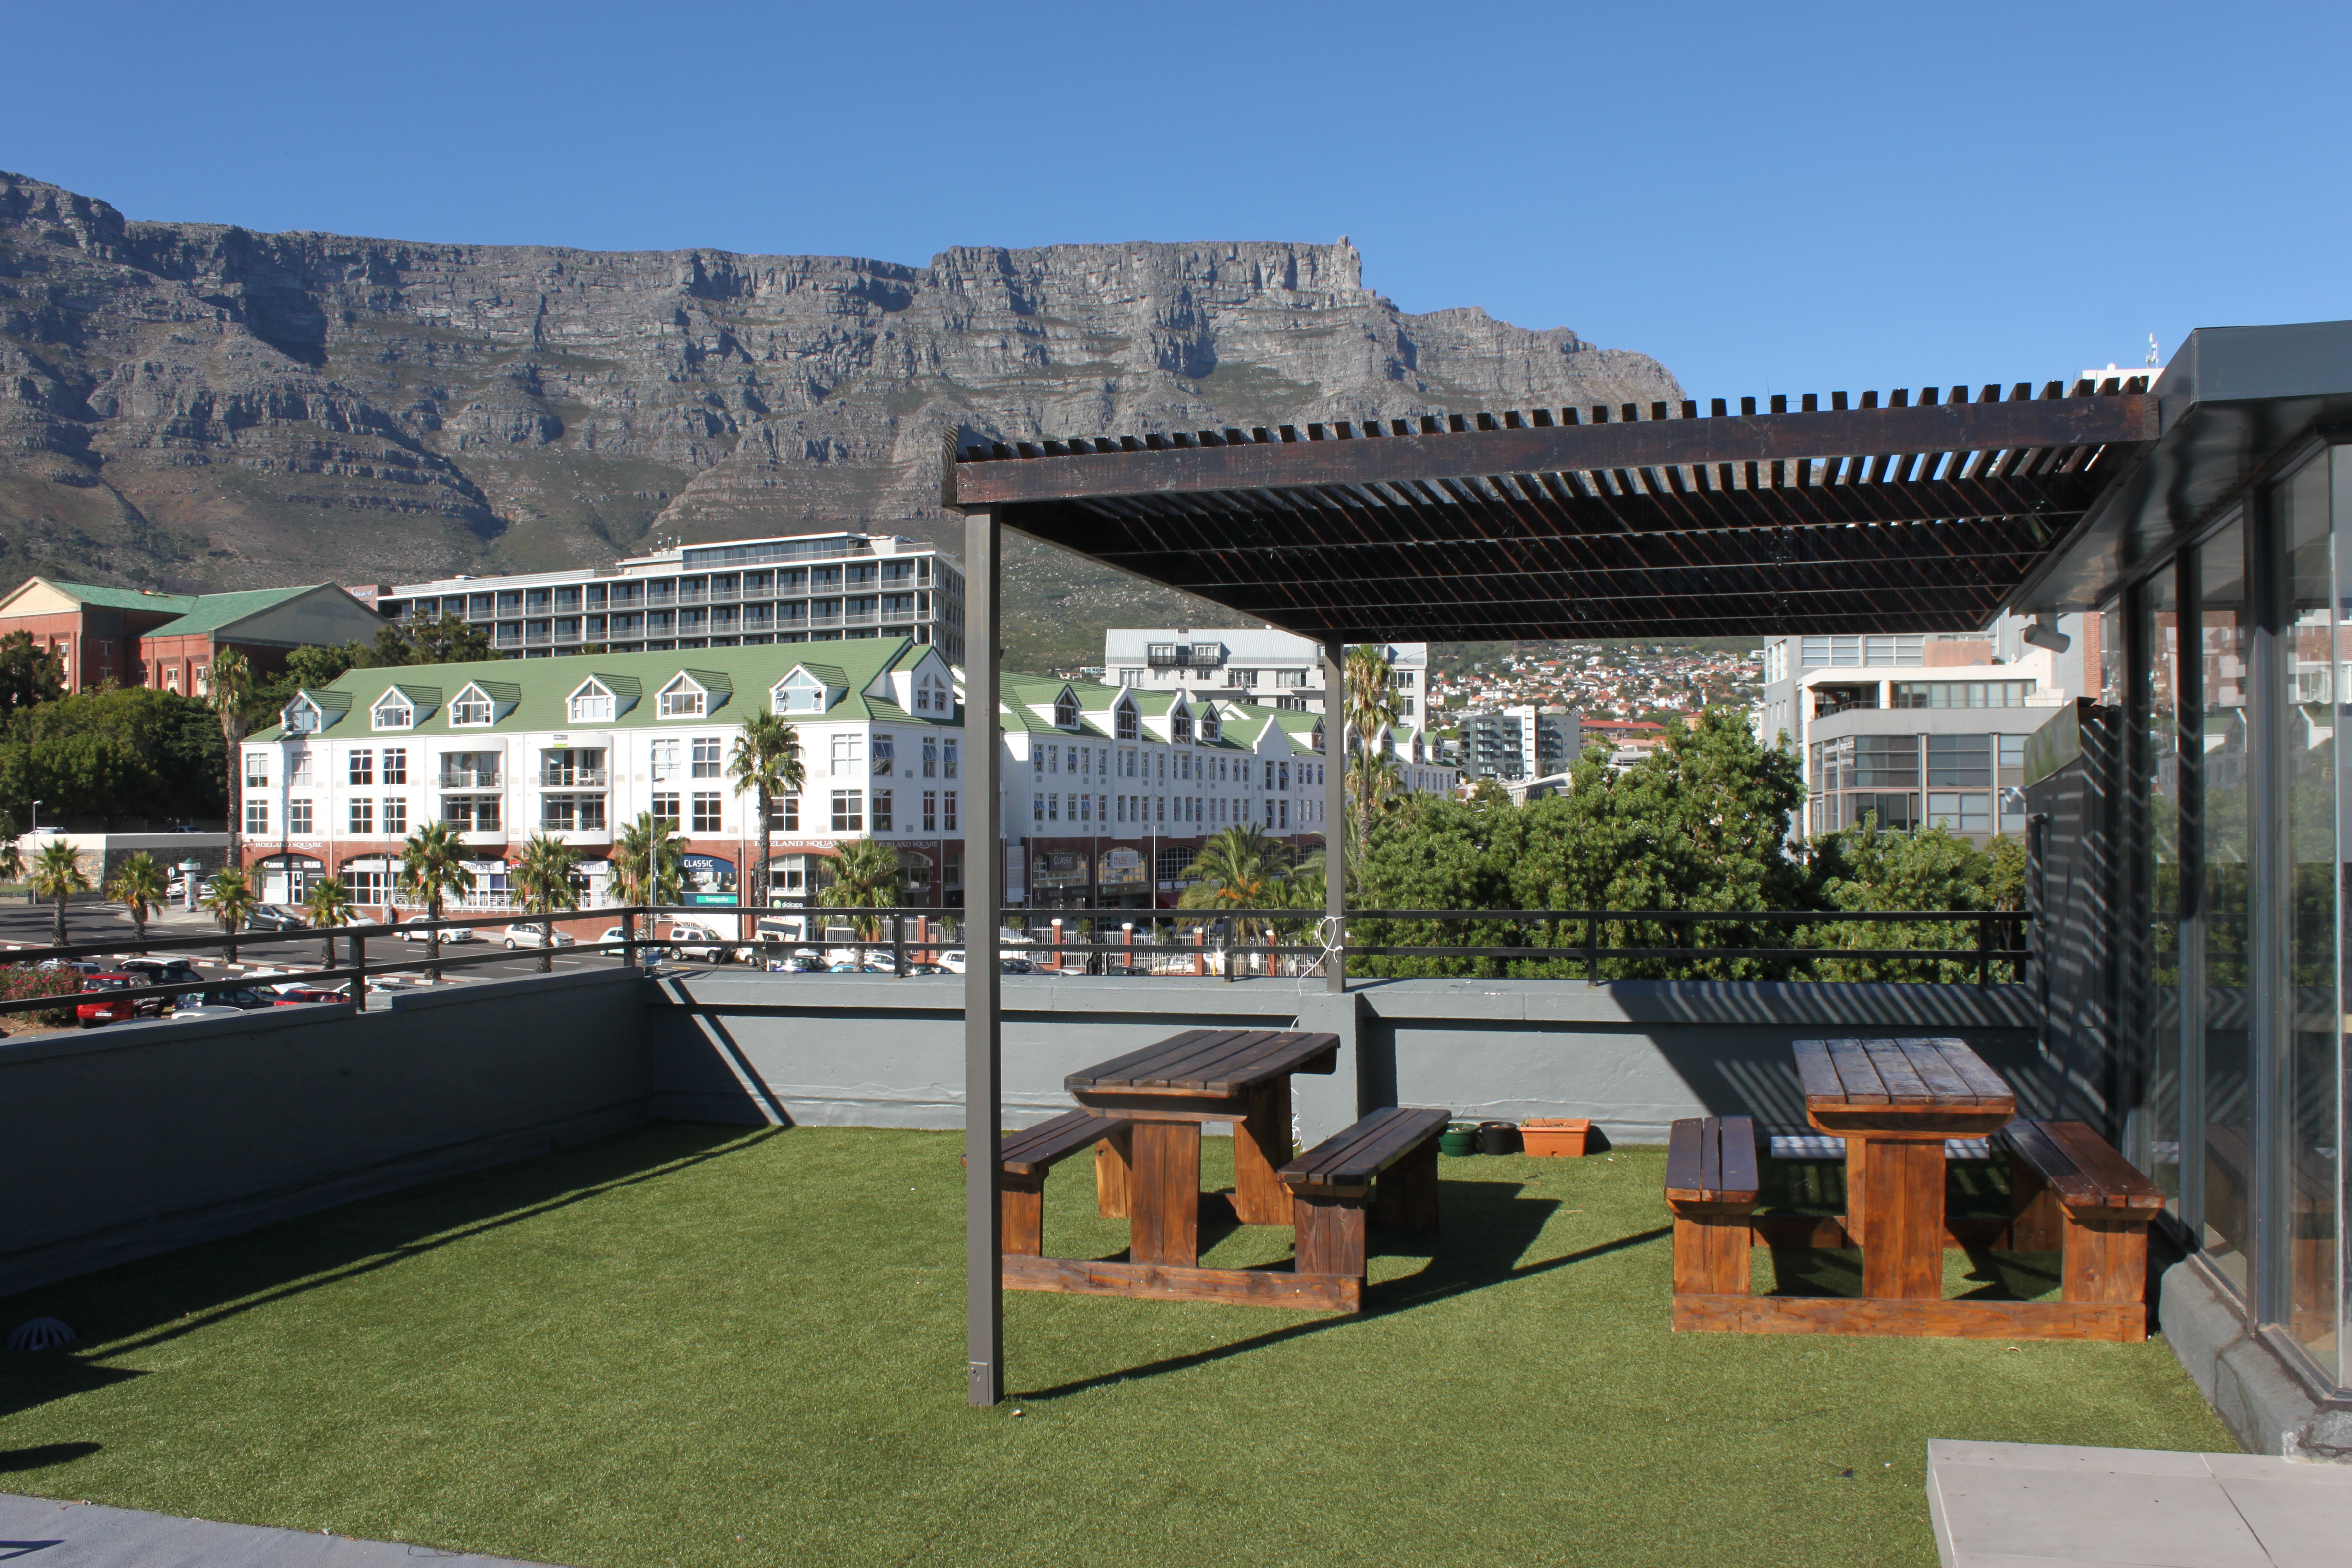 Studenthouse in Zonnebloem, Cape Town